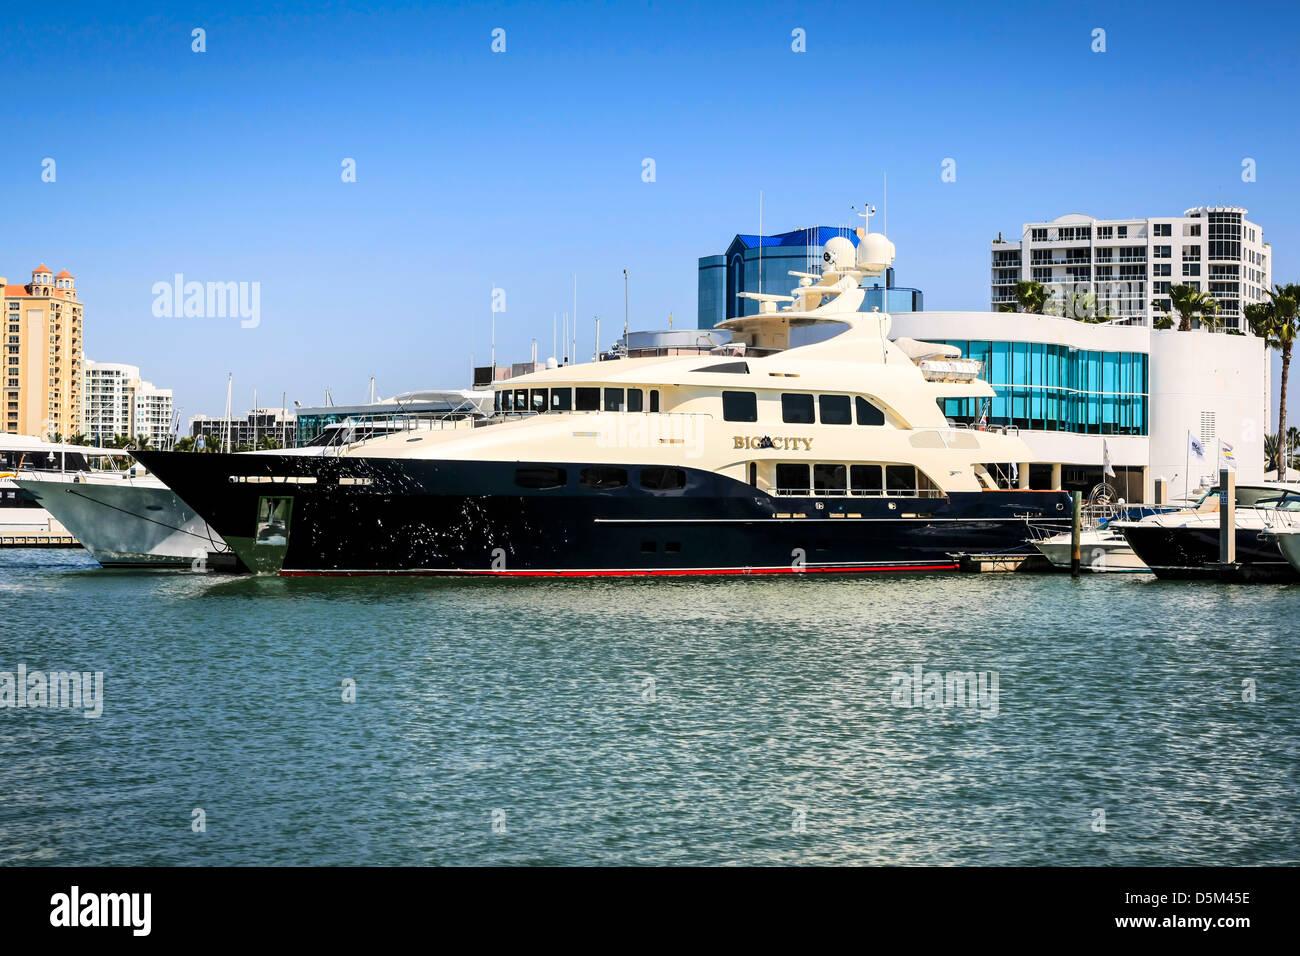 Sarasota Yacht Club >> Sarasota Yacht Club And Harbor Waterfront In Florida Stock Photo